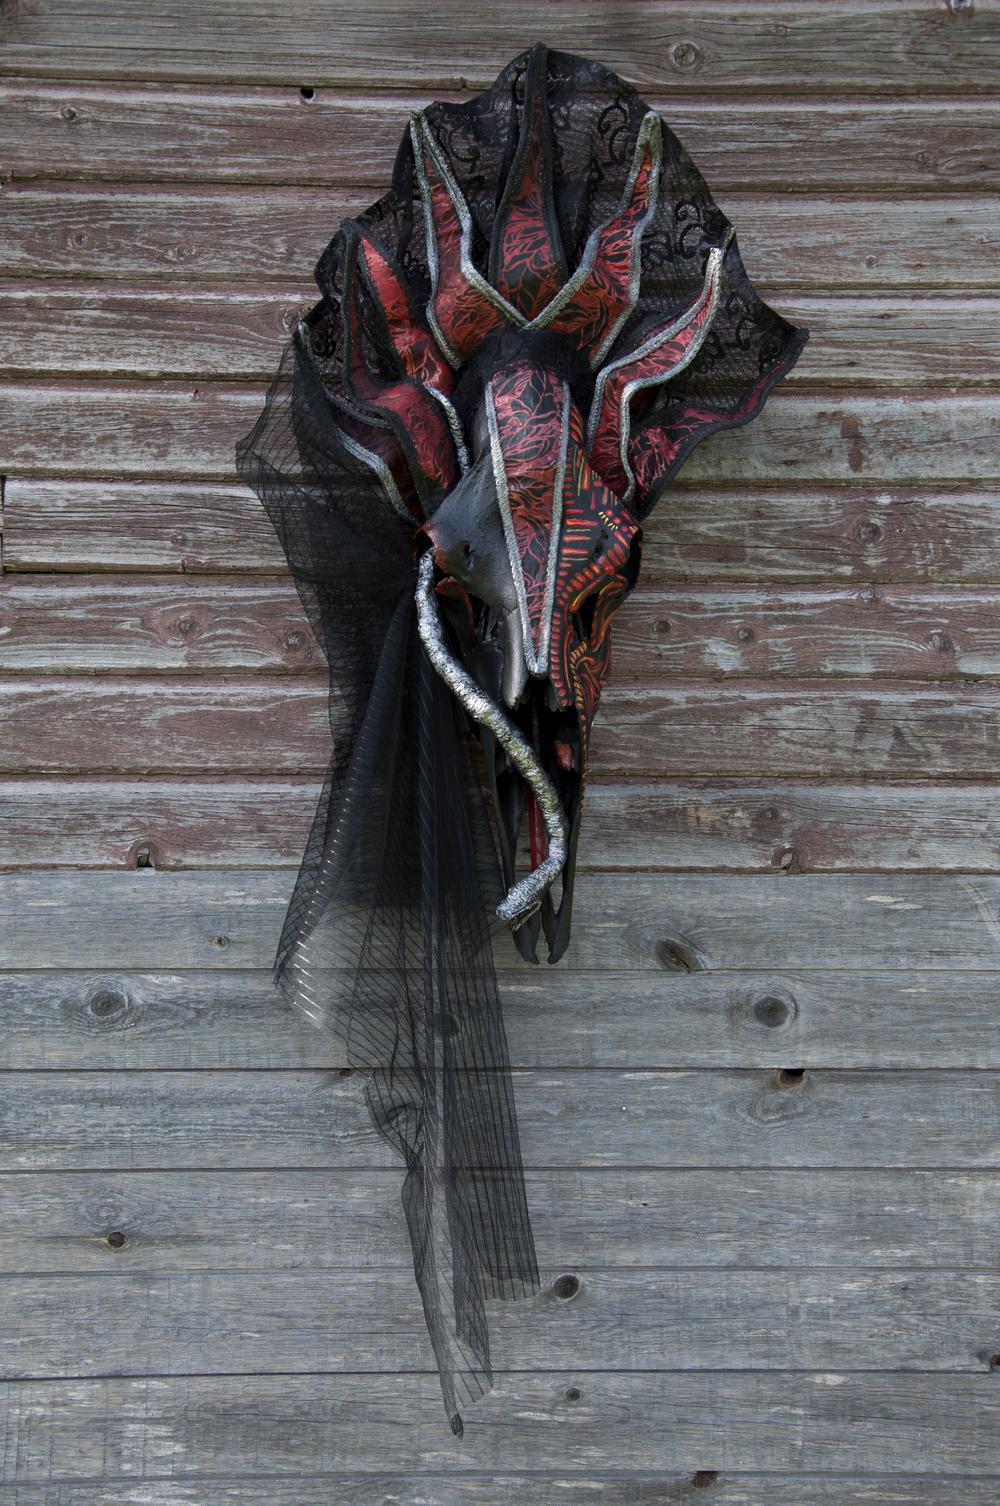 petra-shara-stoor-skull-art-erexhkigal-1.png